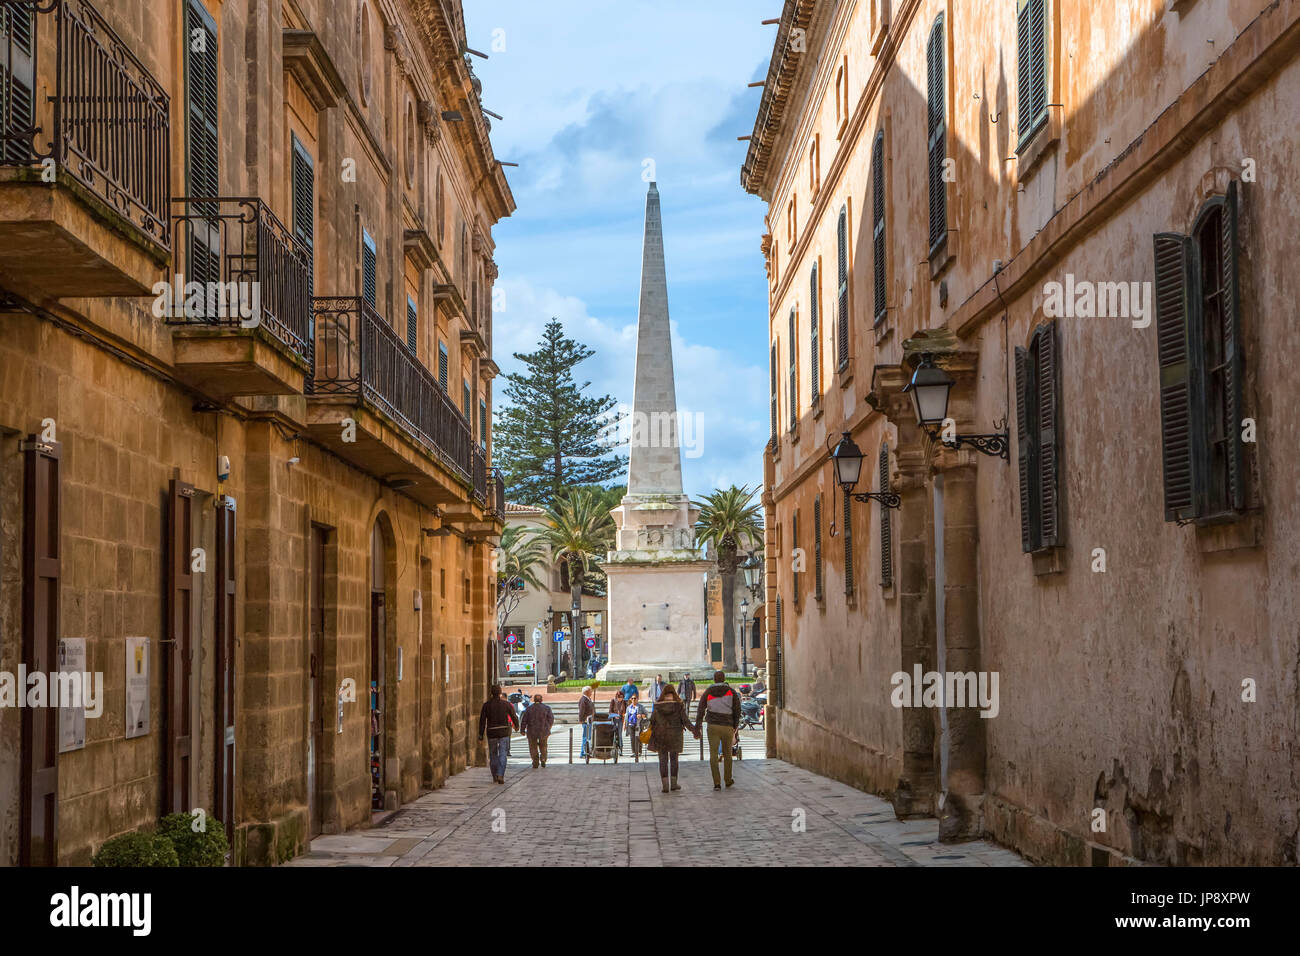 Spain, Balearic Islands, Menorca Island, Ciutadella City, Mayor des Born Street - Stock Image